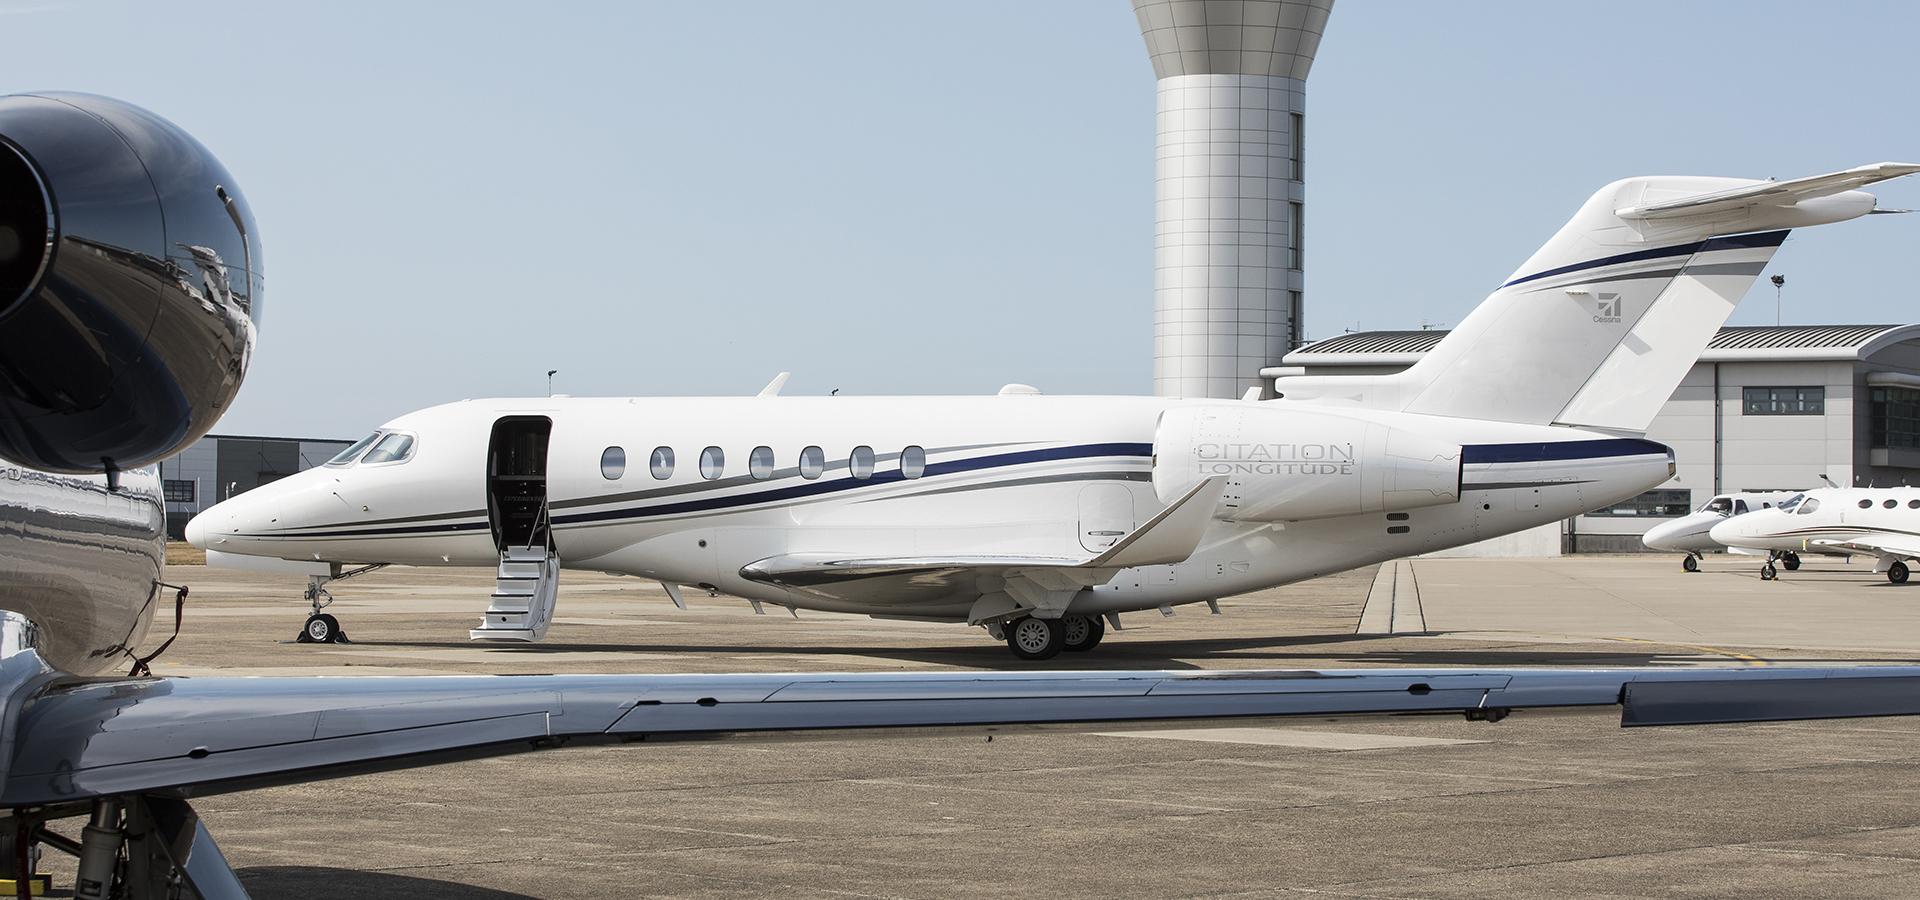 Cessna Citation series